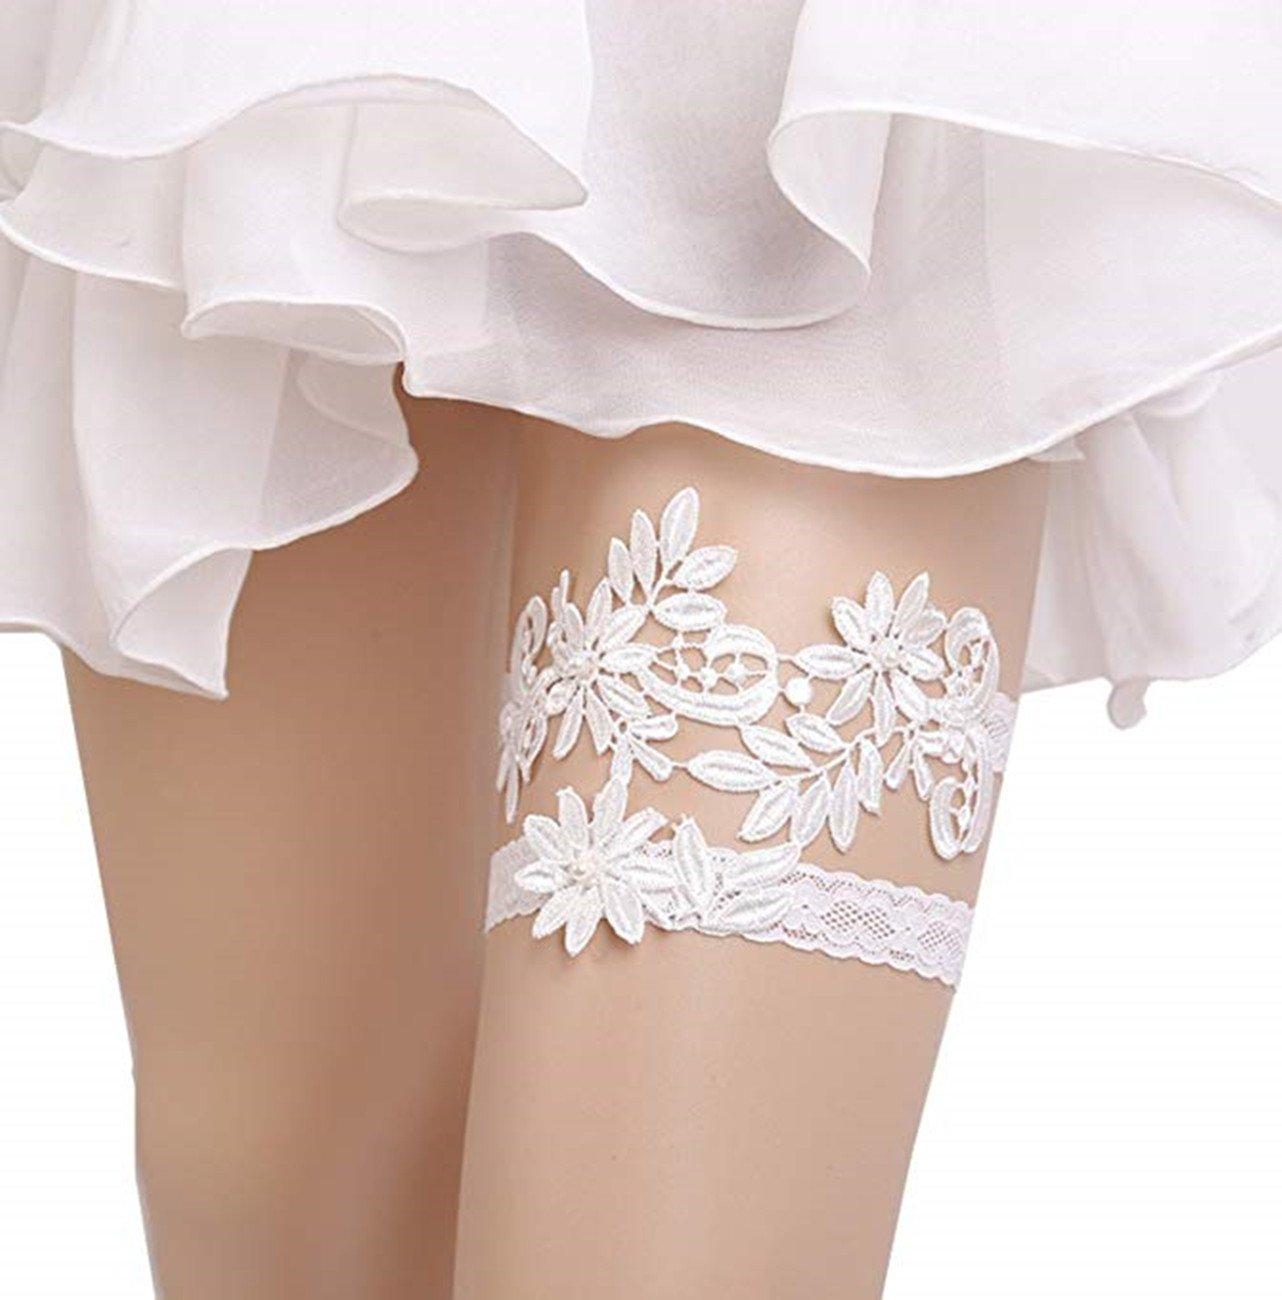 M_Eshop Women Wedding Bridal Garter with Pearl Lace Garter Set (White-1)